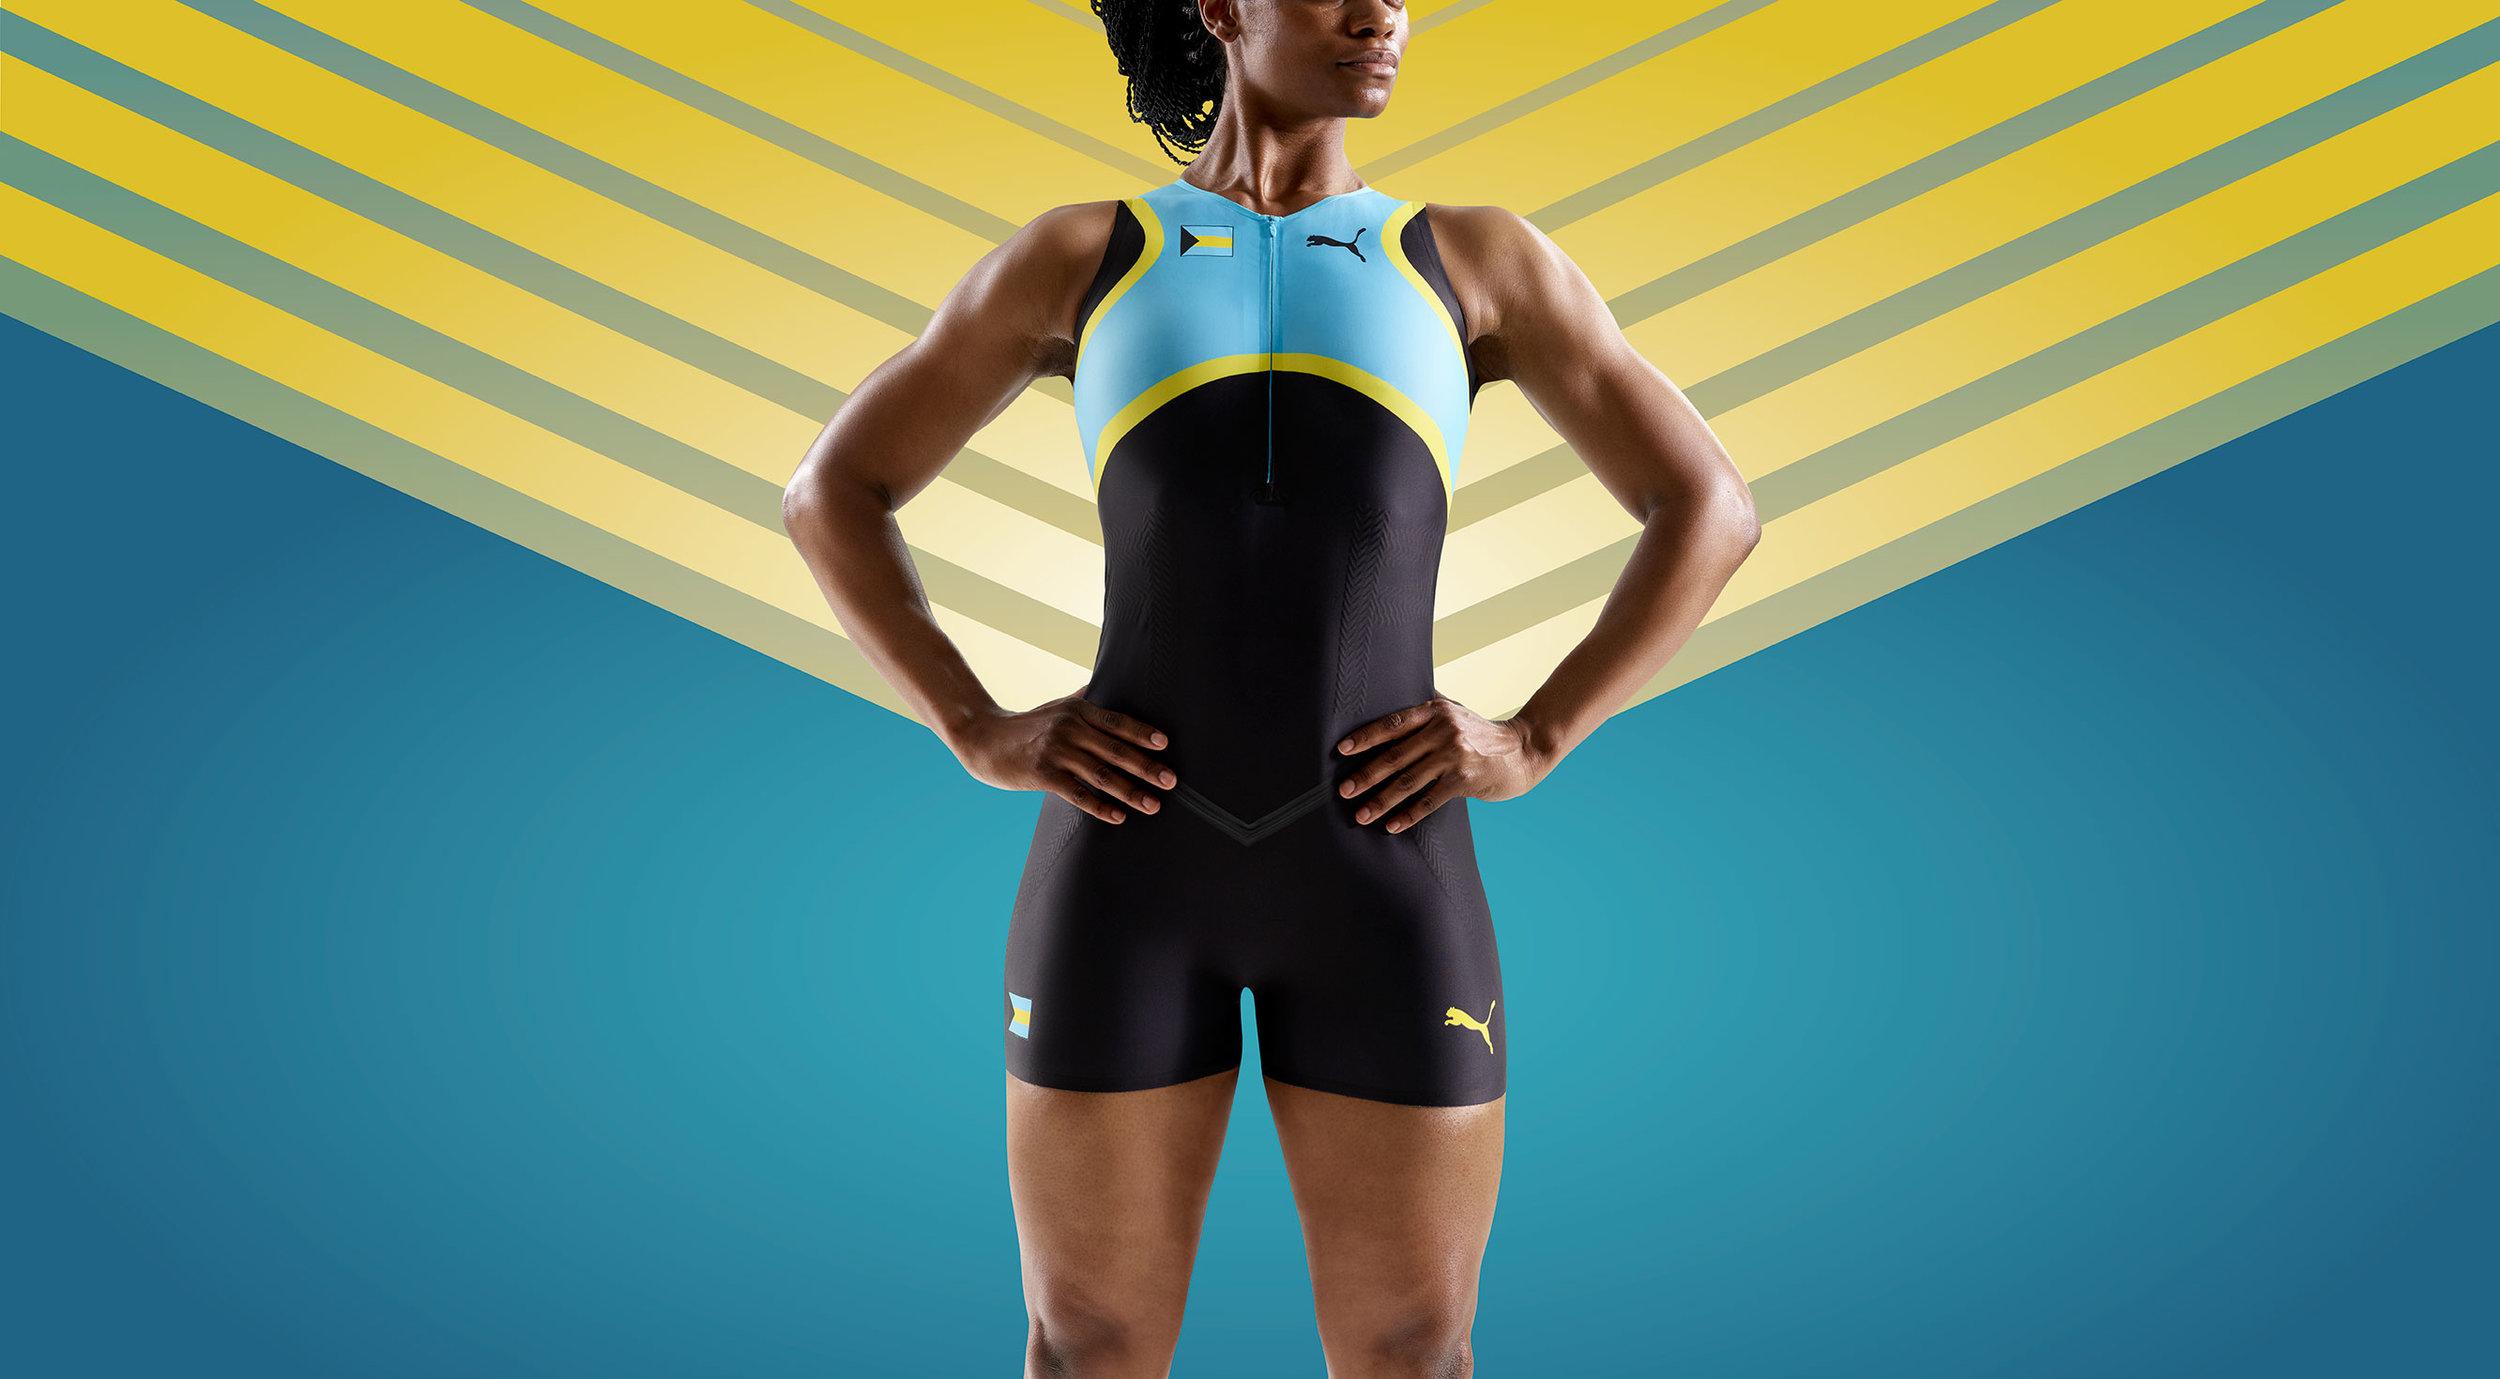 16aw_rt_running_federation-kits_xbahamas_womens_0054_rgb.jpg